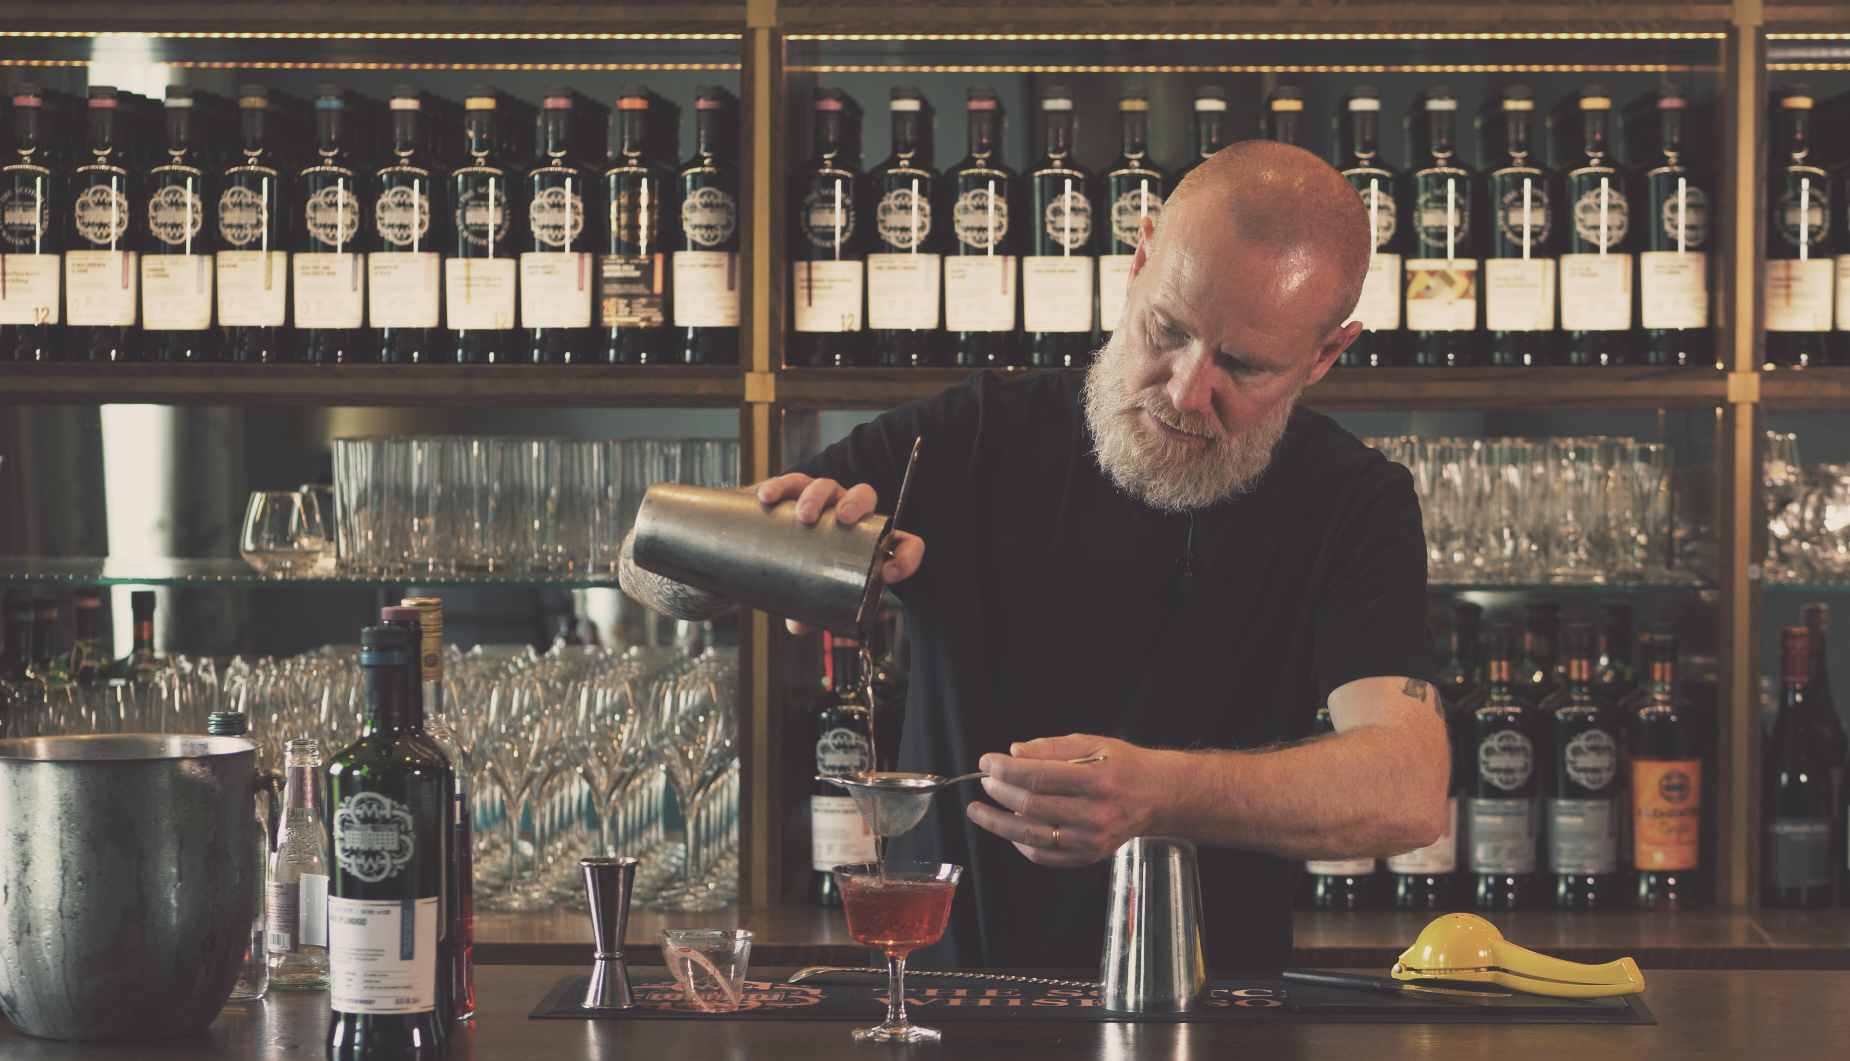 Jason Scott is a world renowned mixologist. Image courtesy of SMWS.